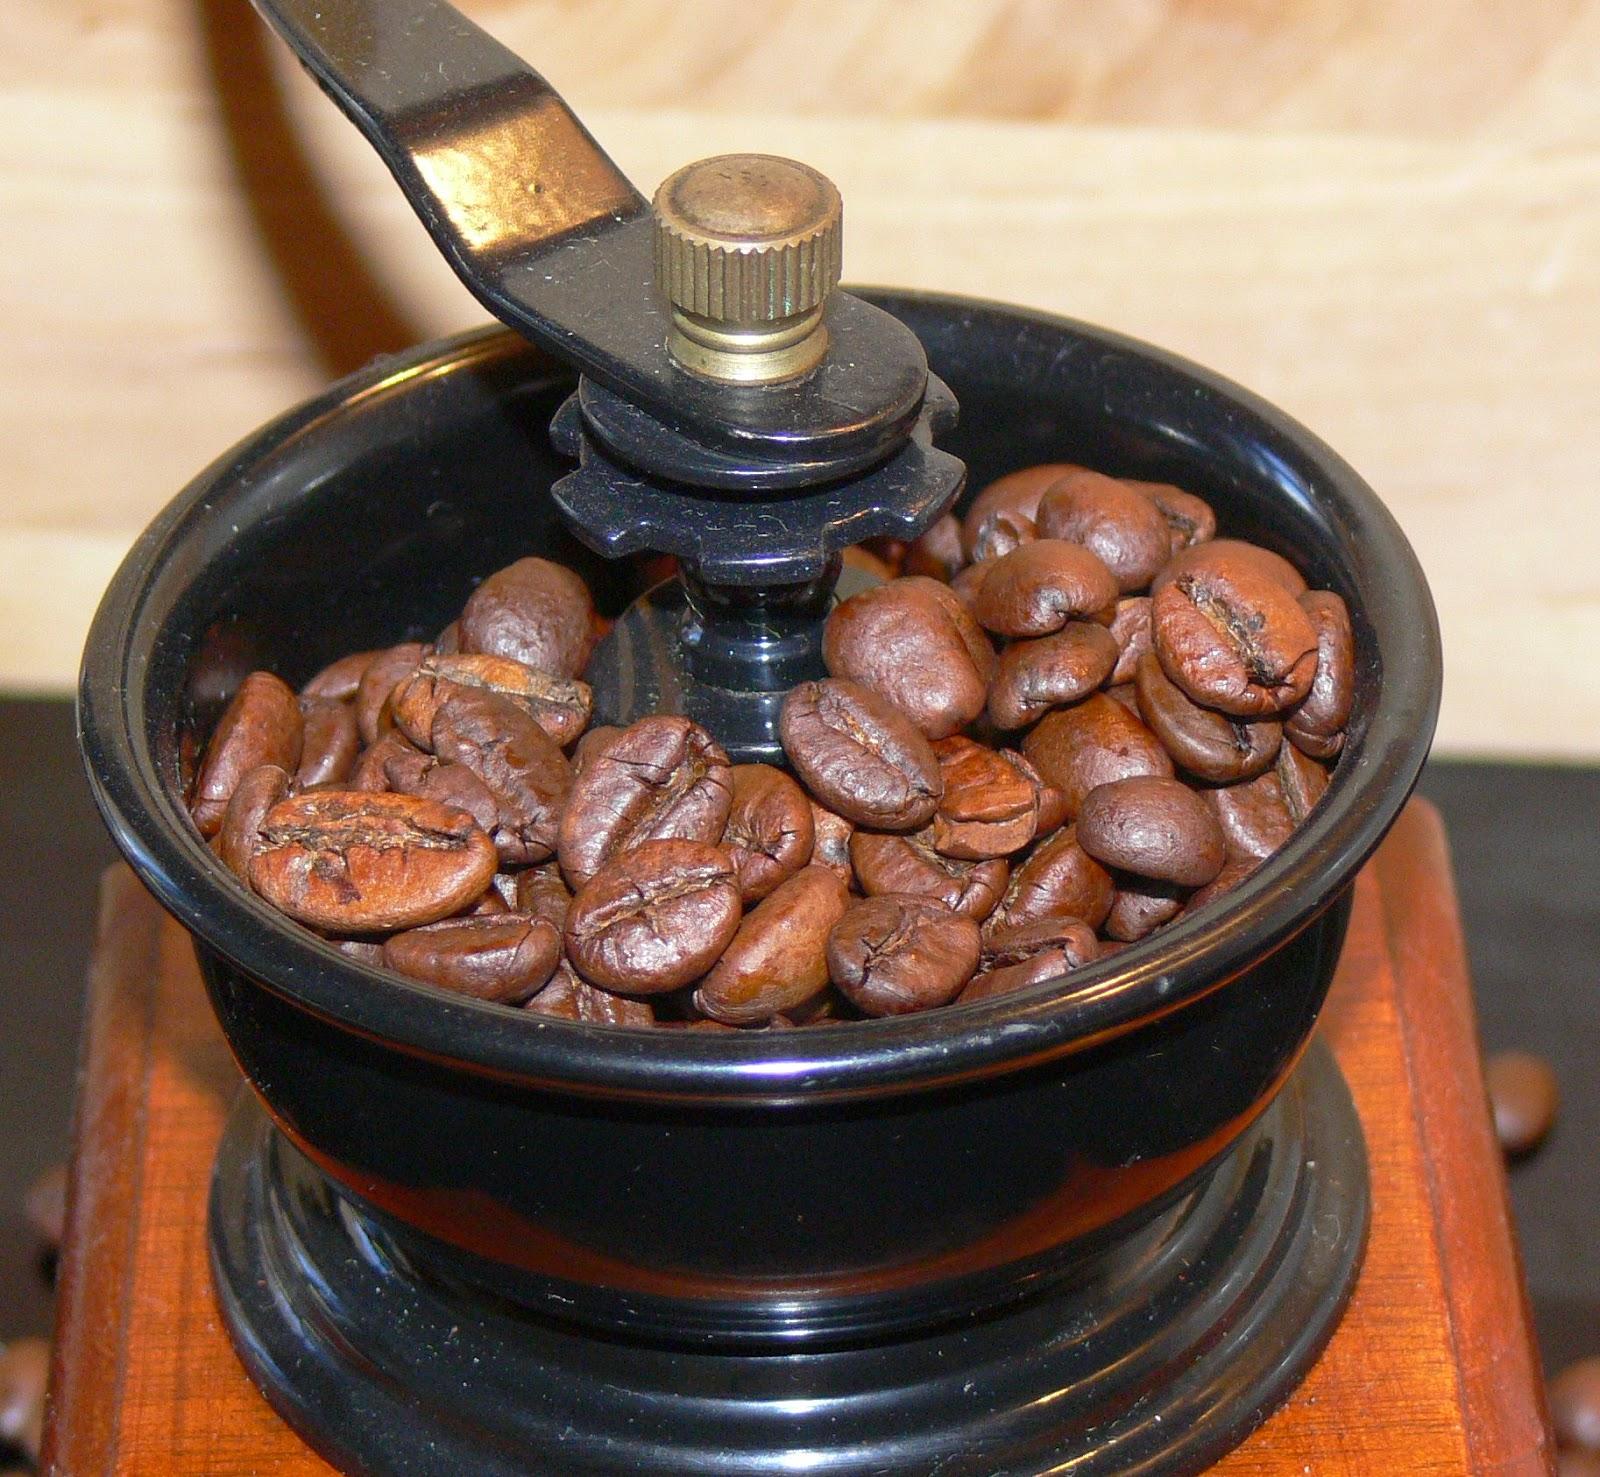 cafe moler grano cafe